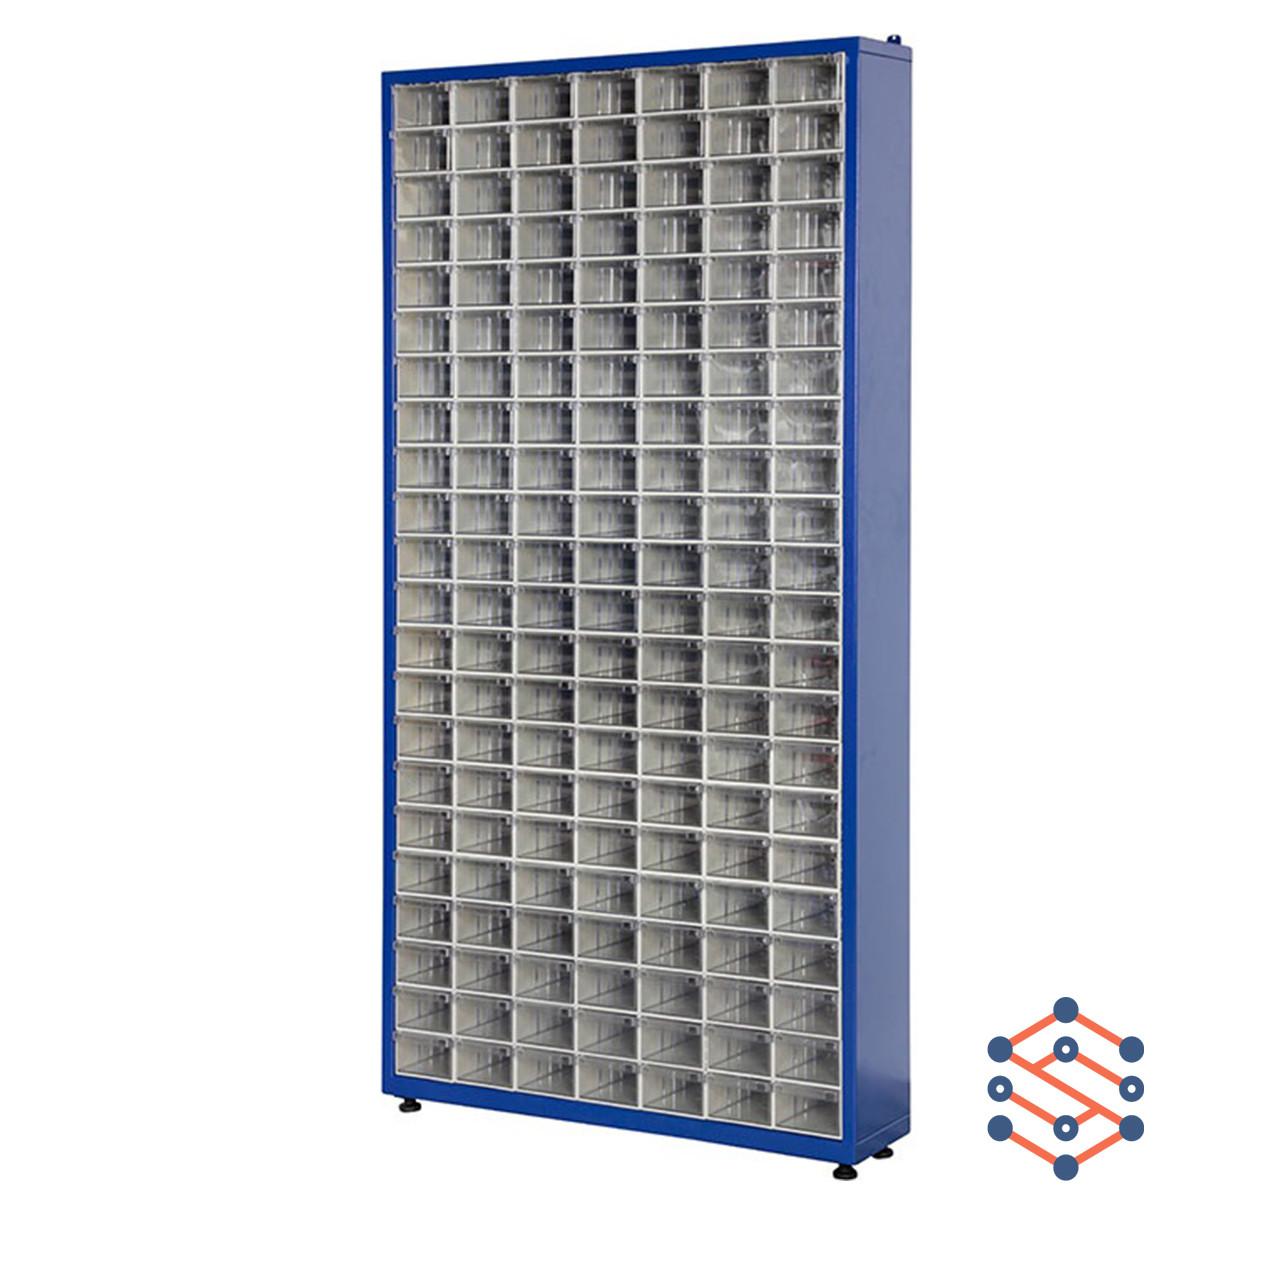 Односторонний металлический шкаф с пластиковыми лотками 915x205x1860 мм